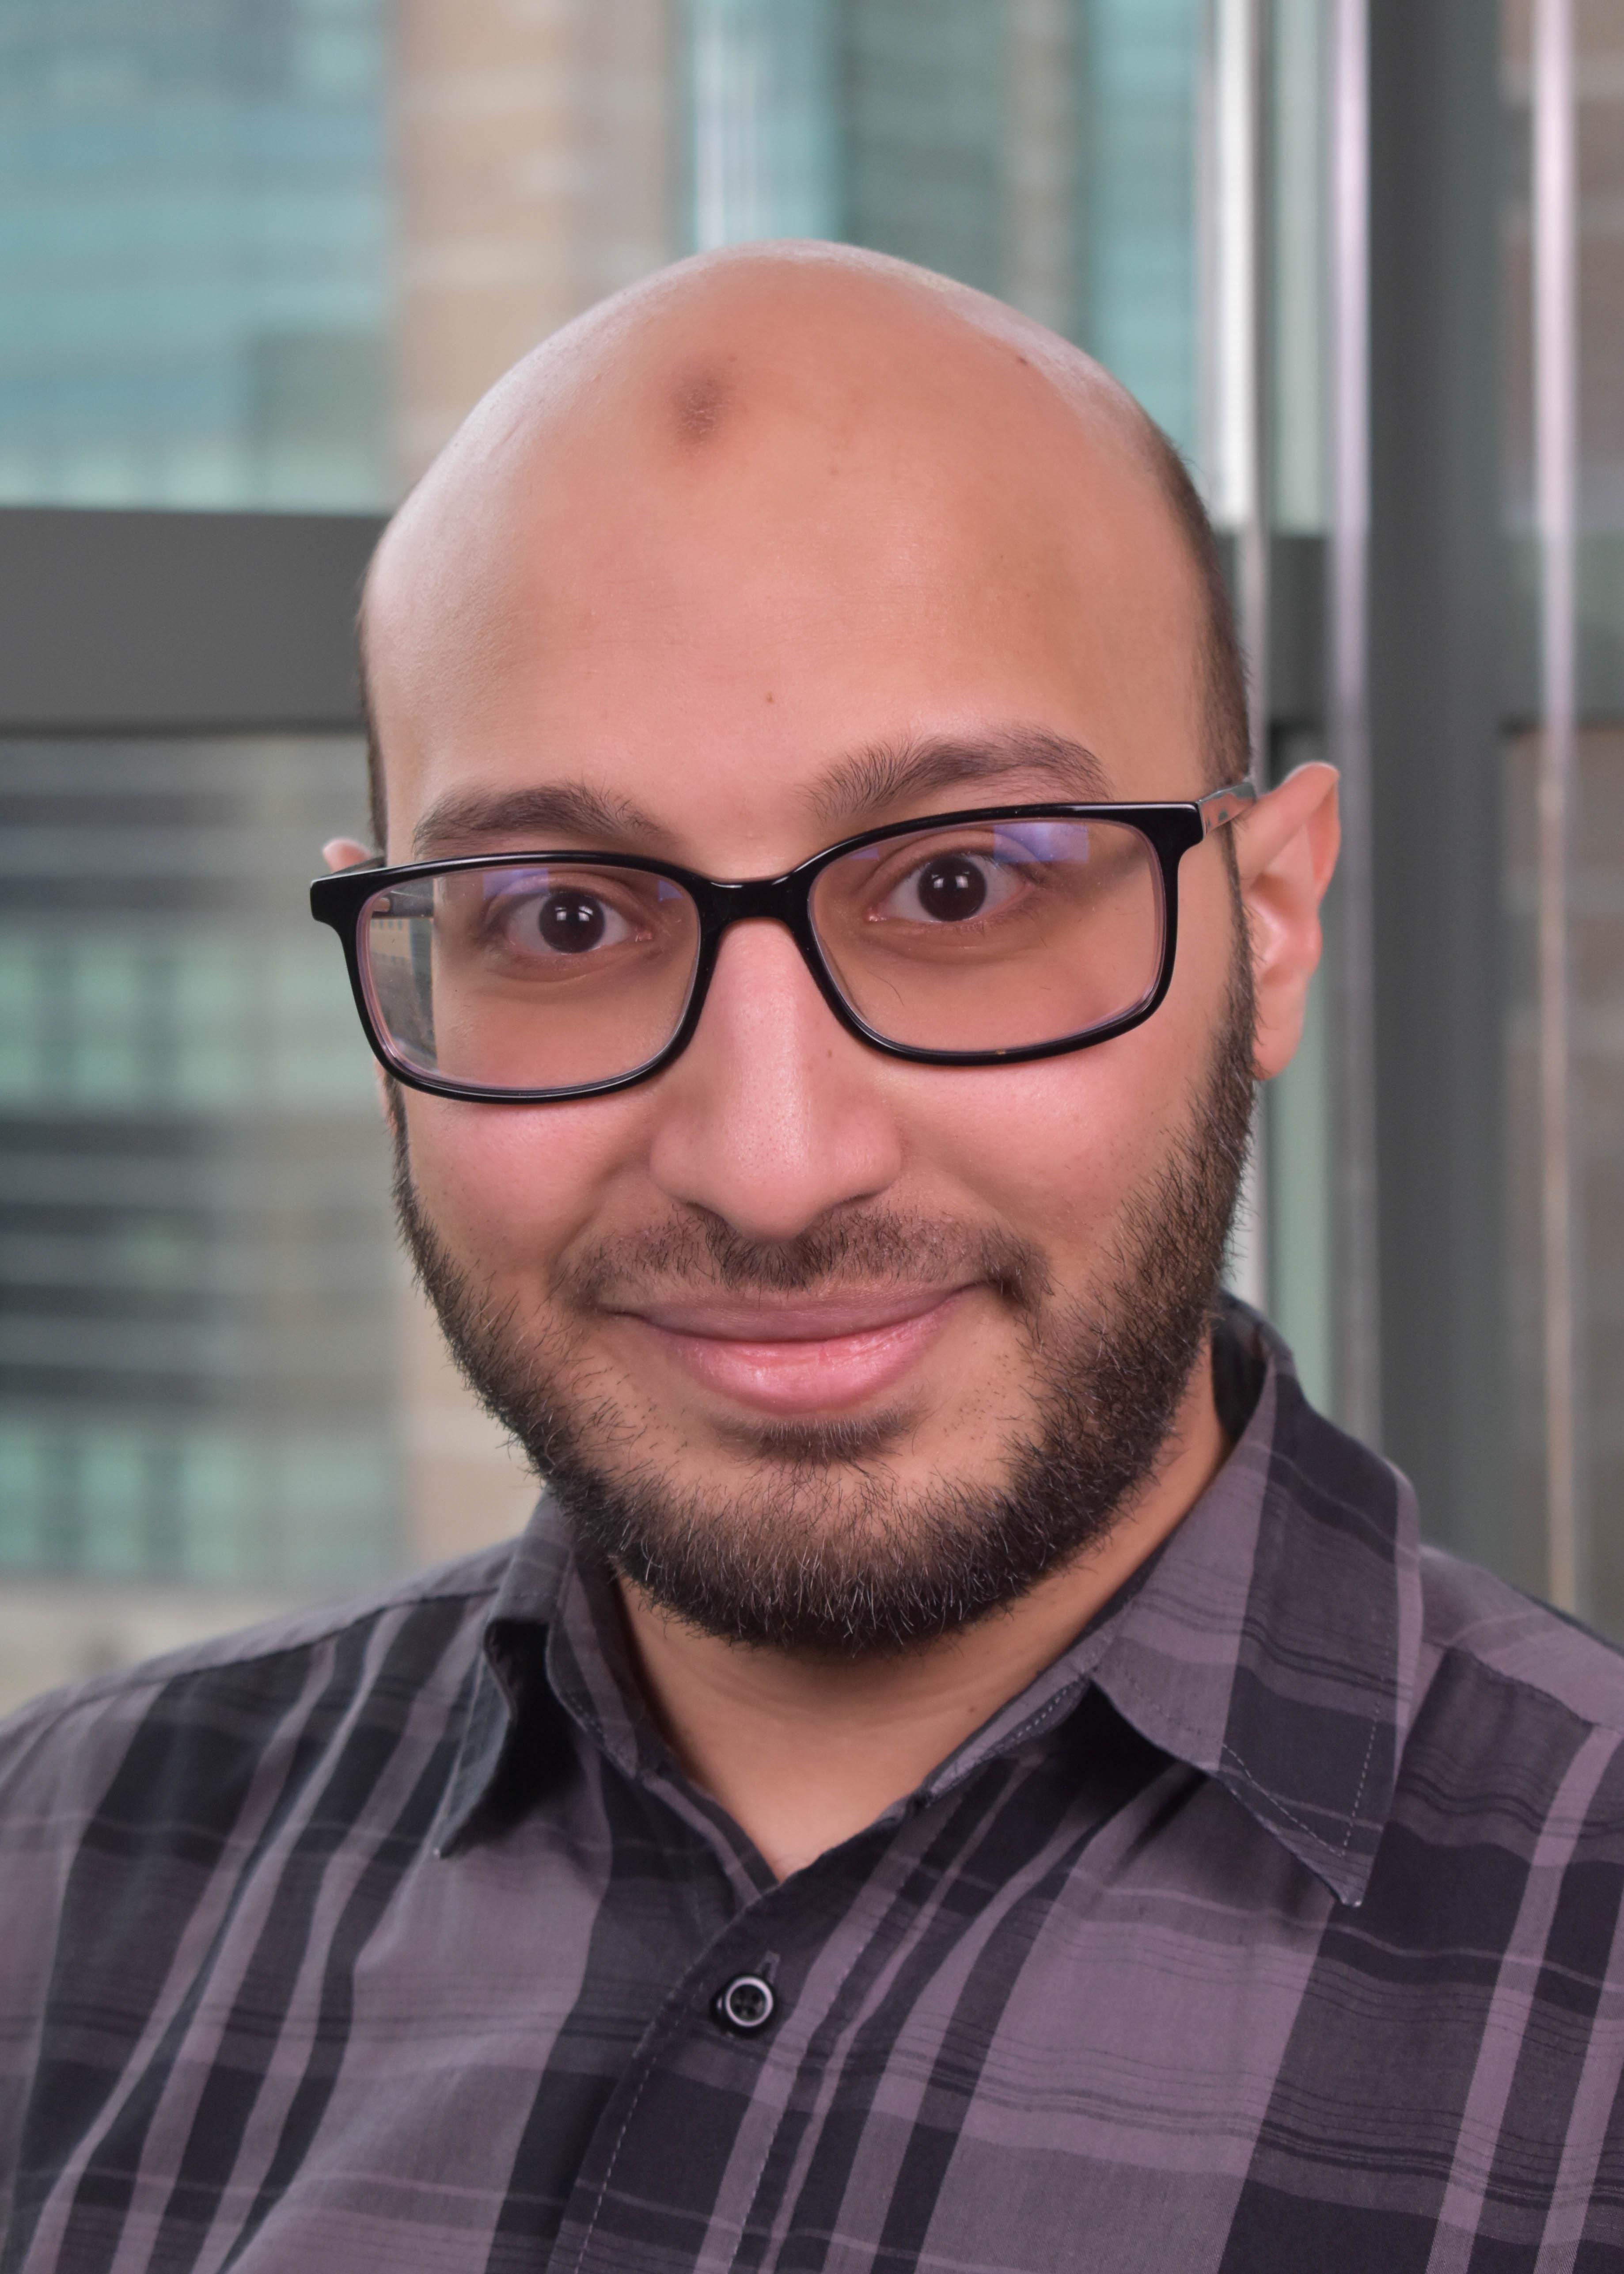 Abdulrahman Mahmoud